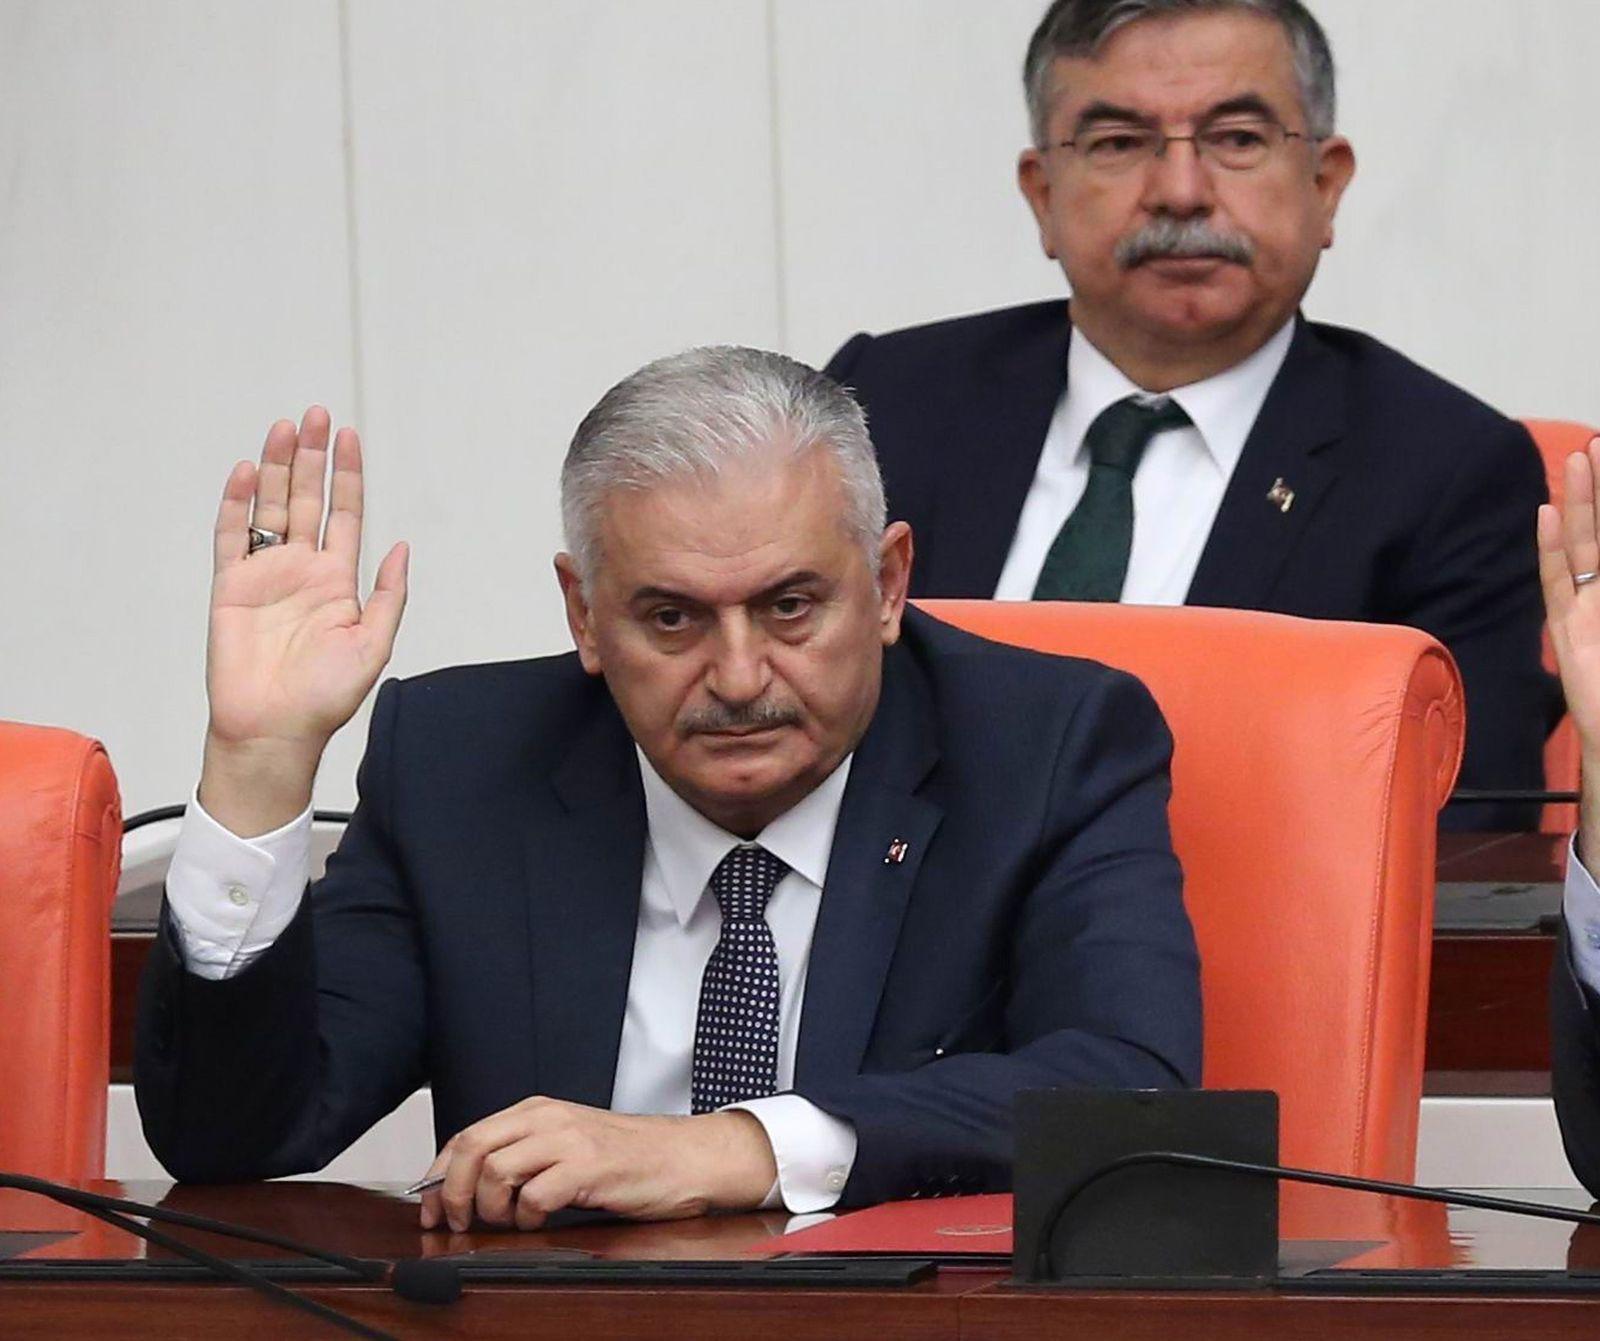 TURKEY-POLITICS-YILDIRIM